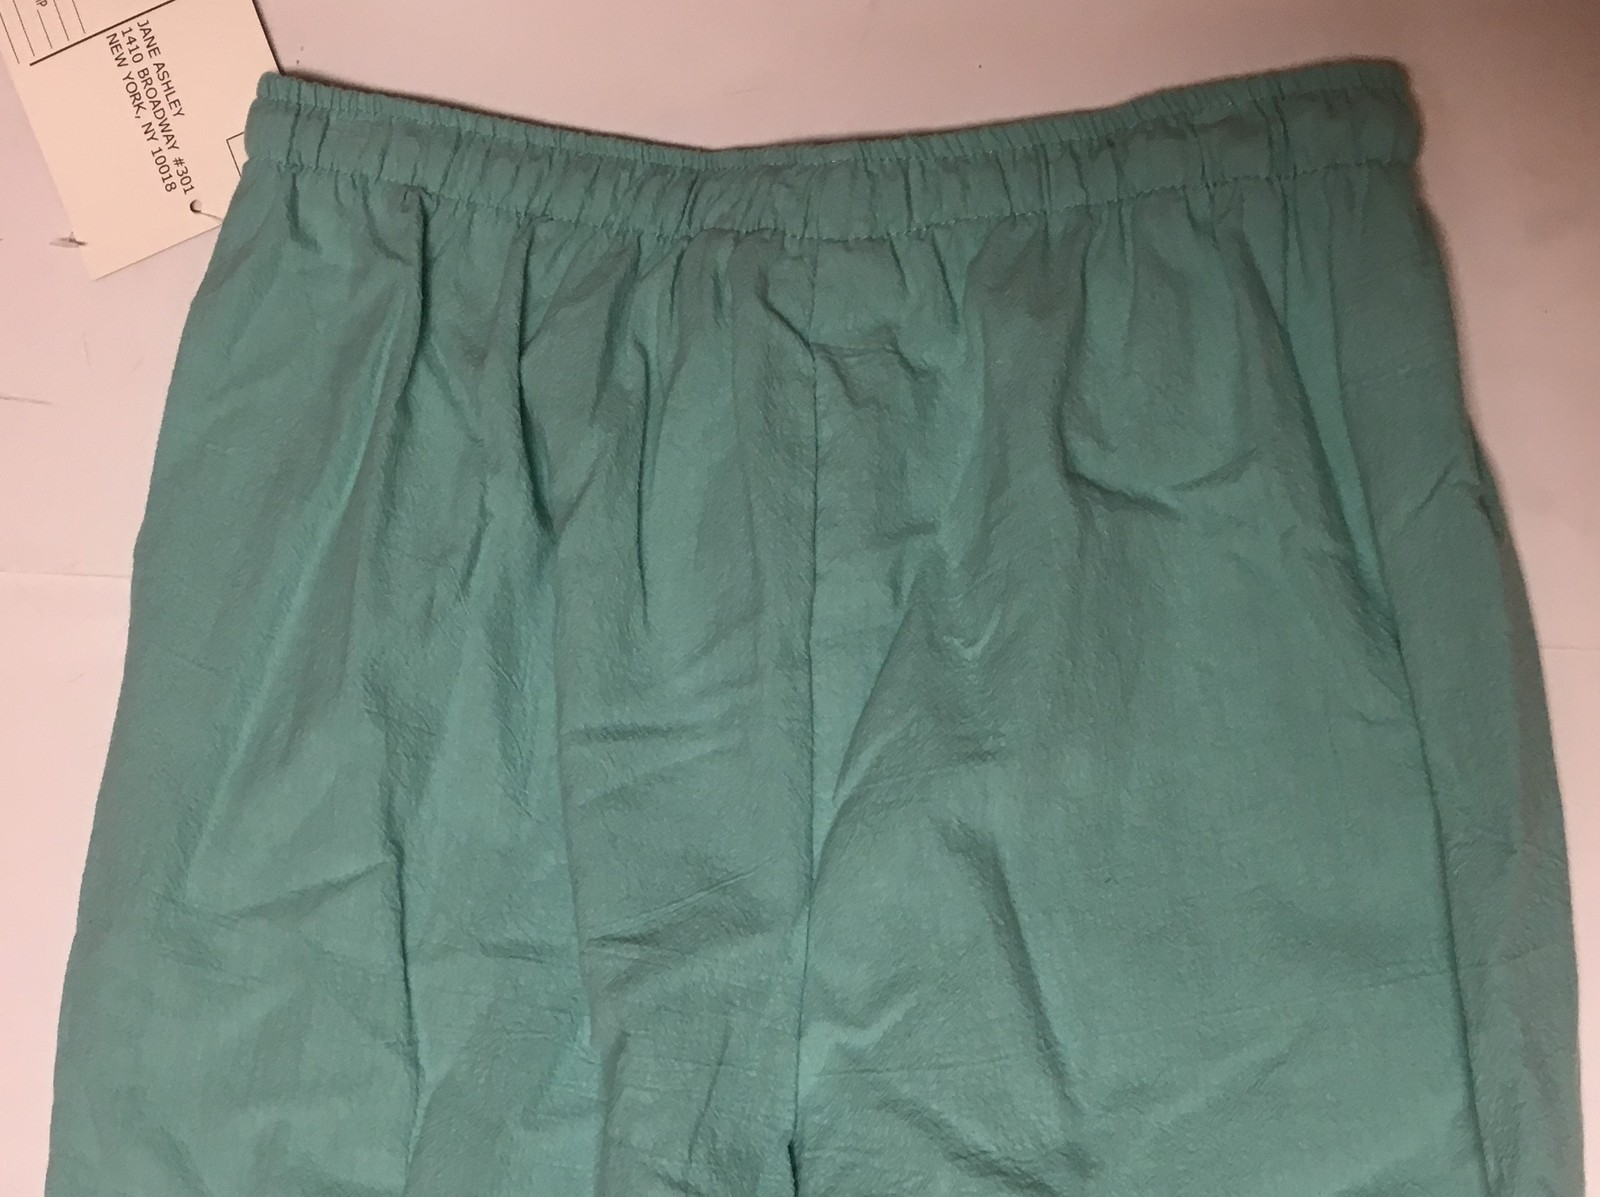 Jane Ashley Casual Lifestyle Lime Aqua Capri Pants Sz L Drawstring image 7